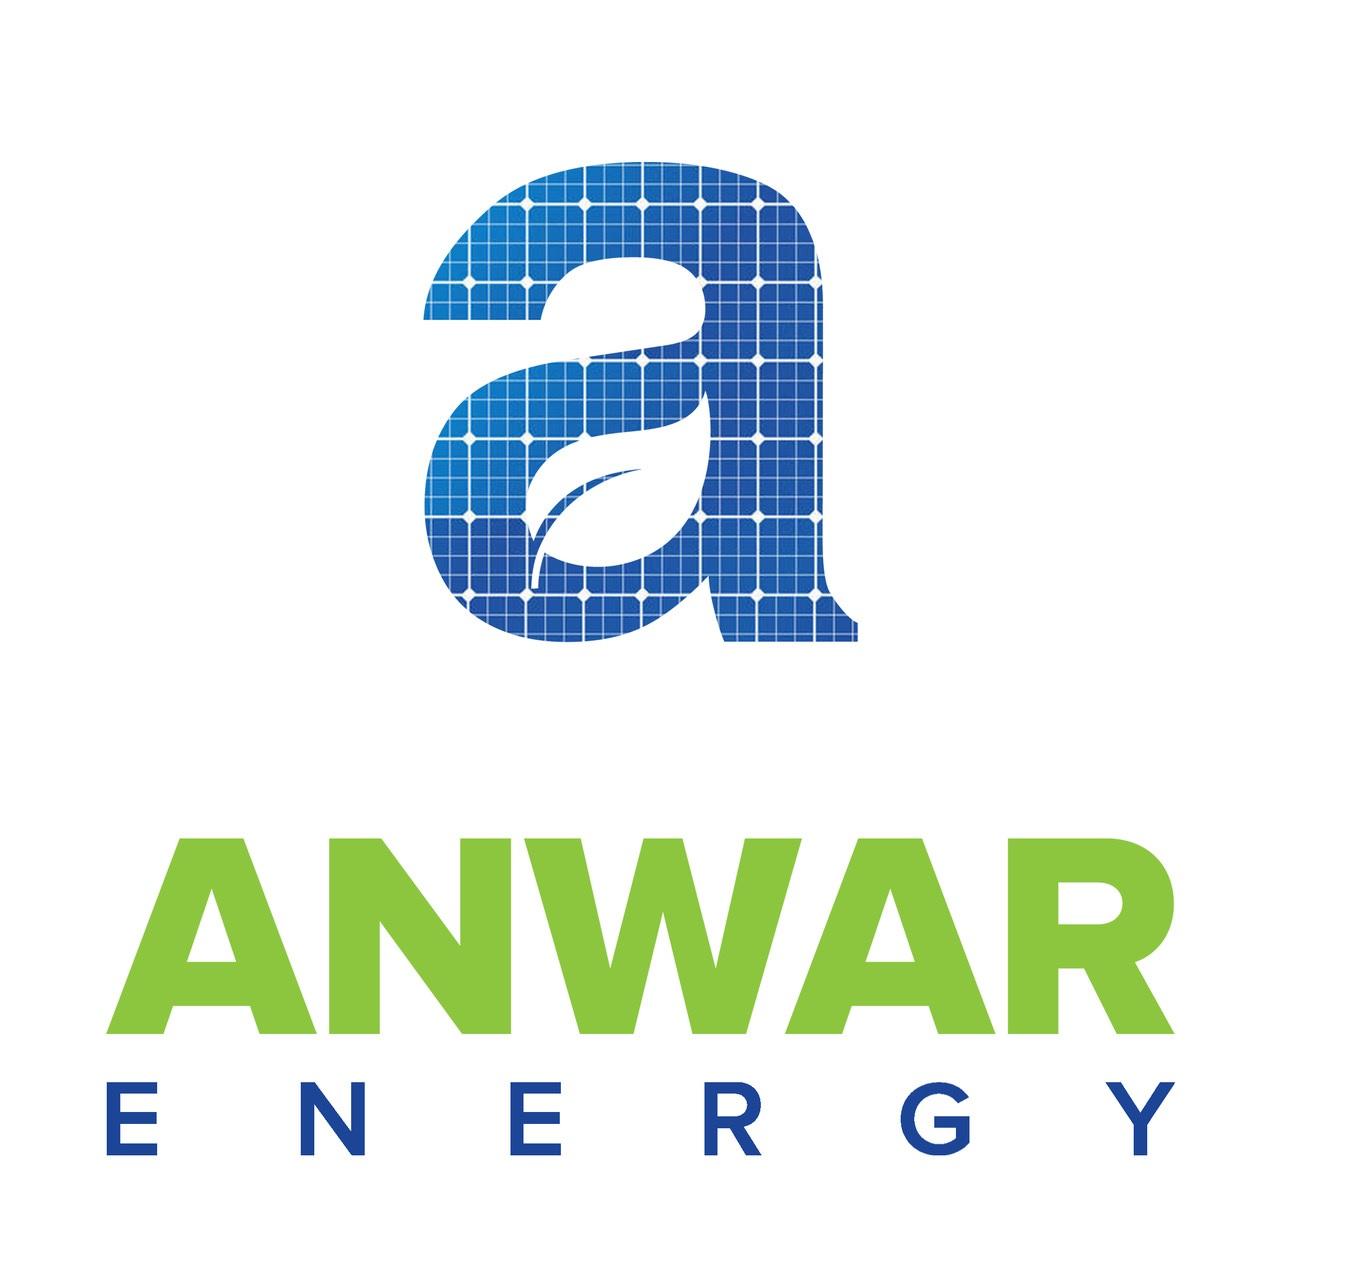 Anwar Energy Company